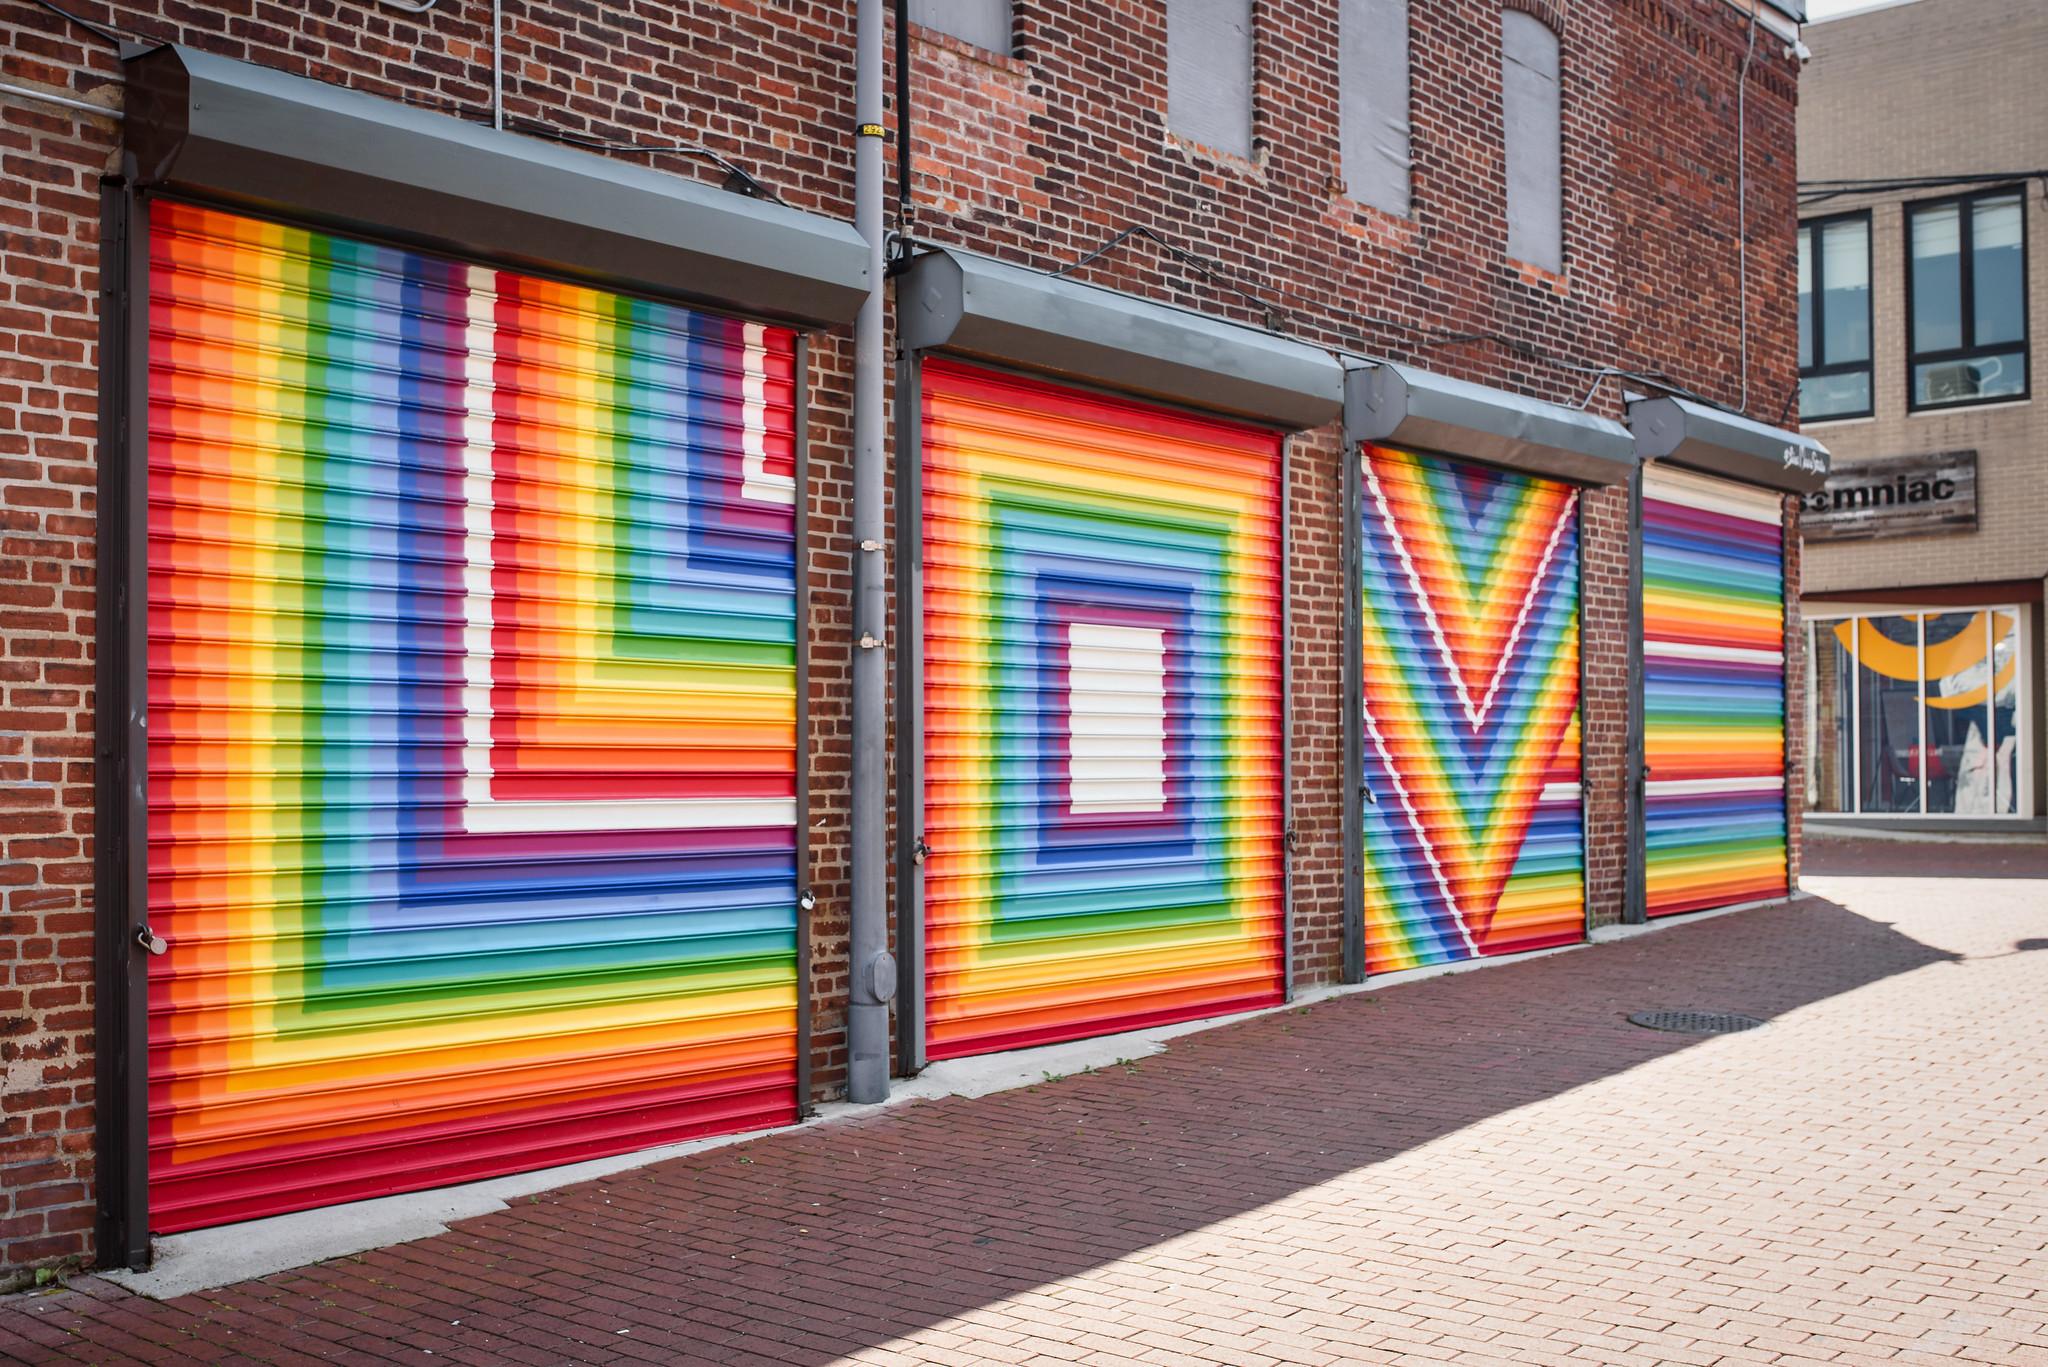 Blagden Alley, Love mural